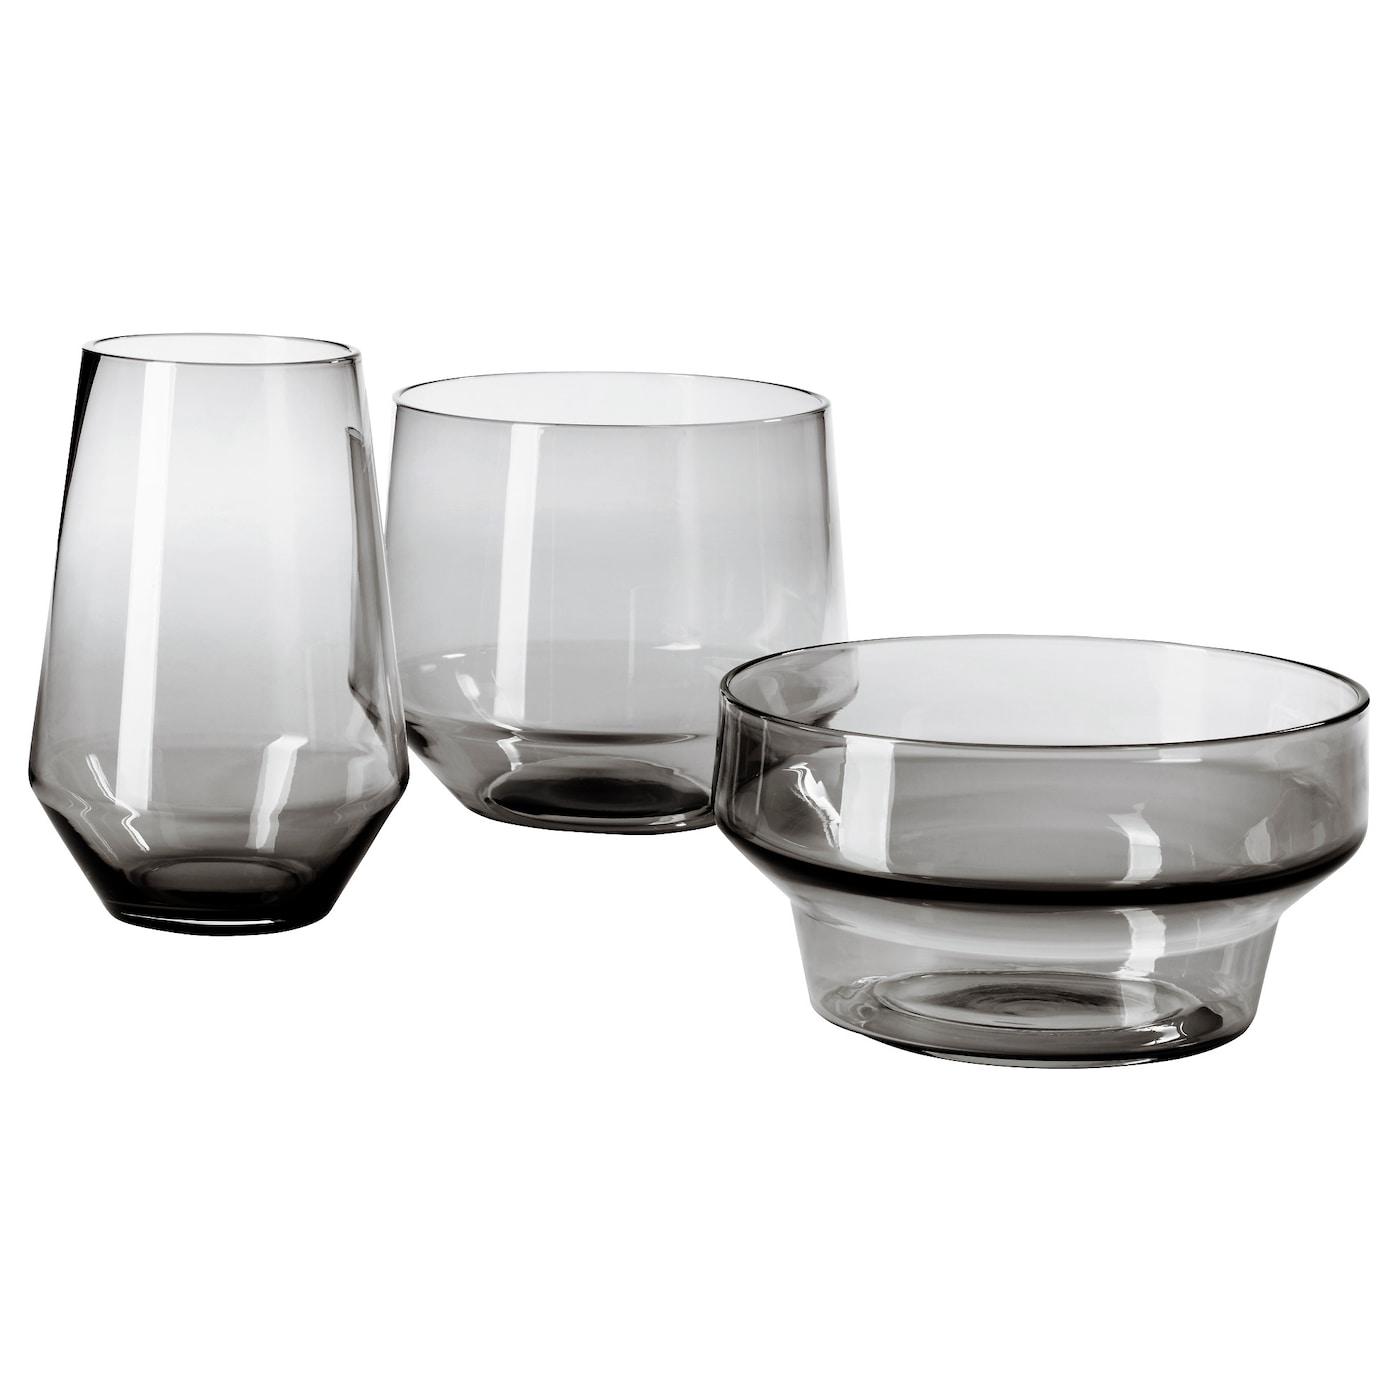 Vases decorative vase sets ikea ikea ikea ps 2017 vase set of 3 handmade each vase has been shaped reviewsmspy